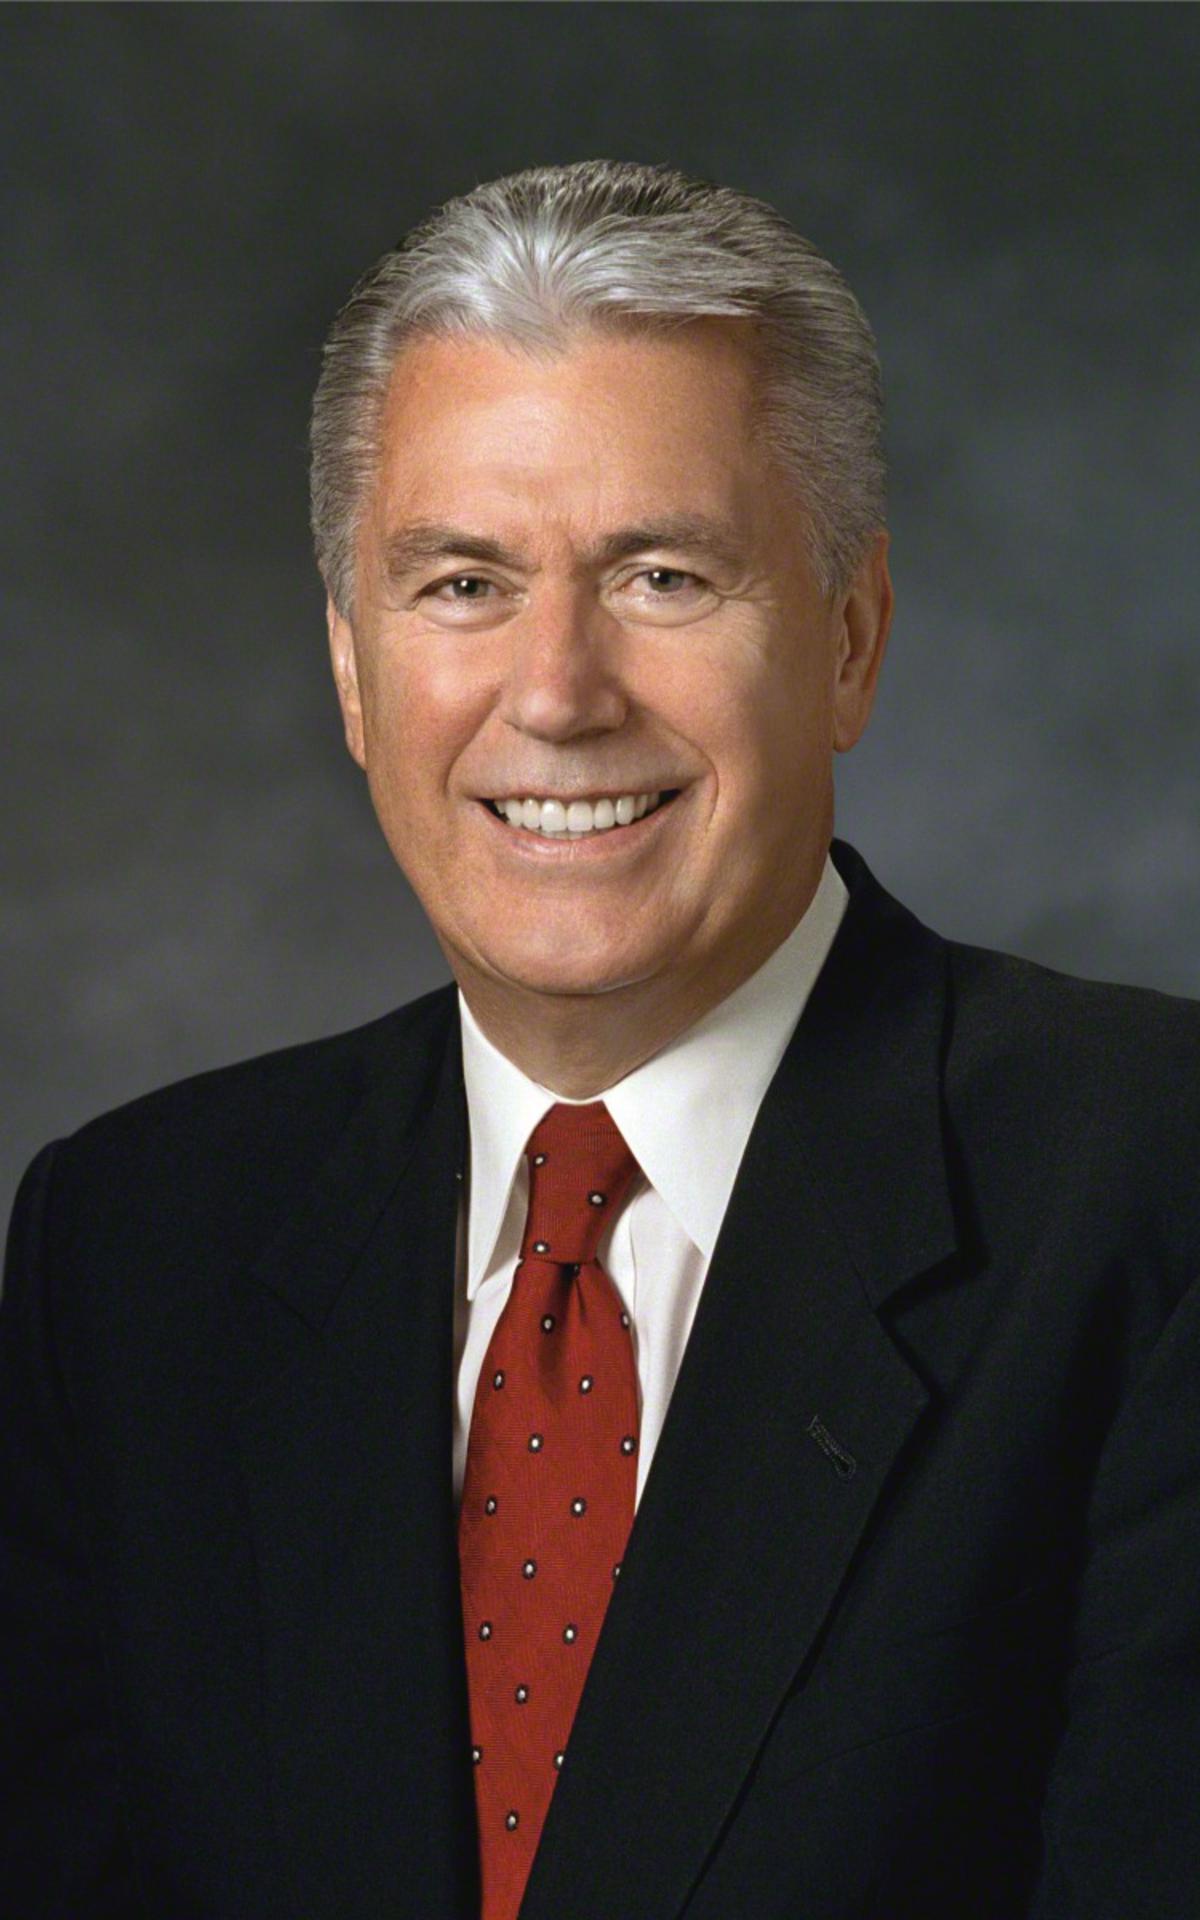 Dieter F. Uchtdorf apostolo mormoni.jpg